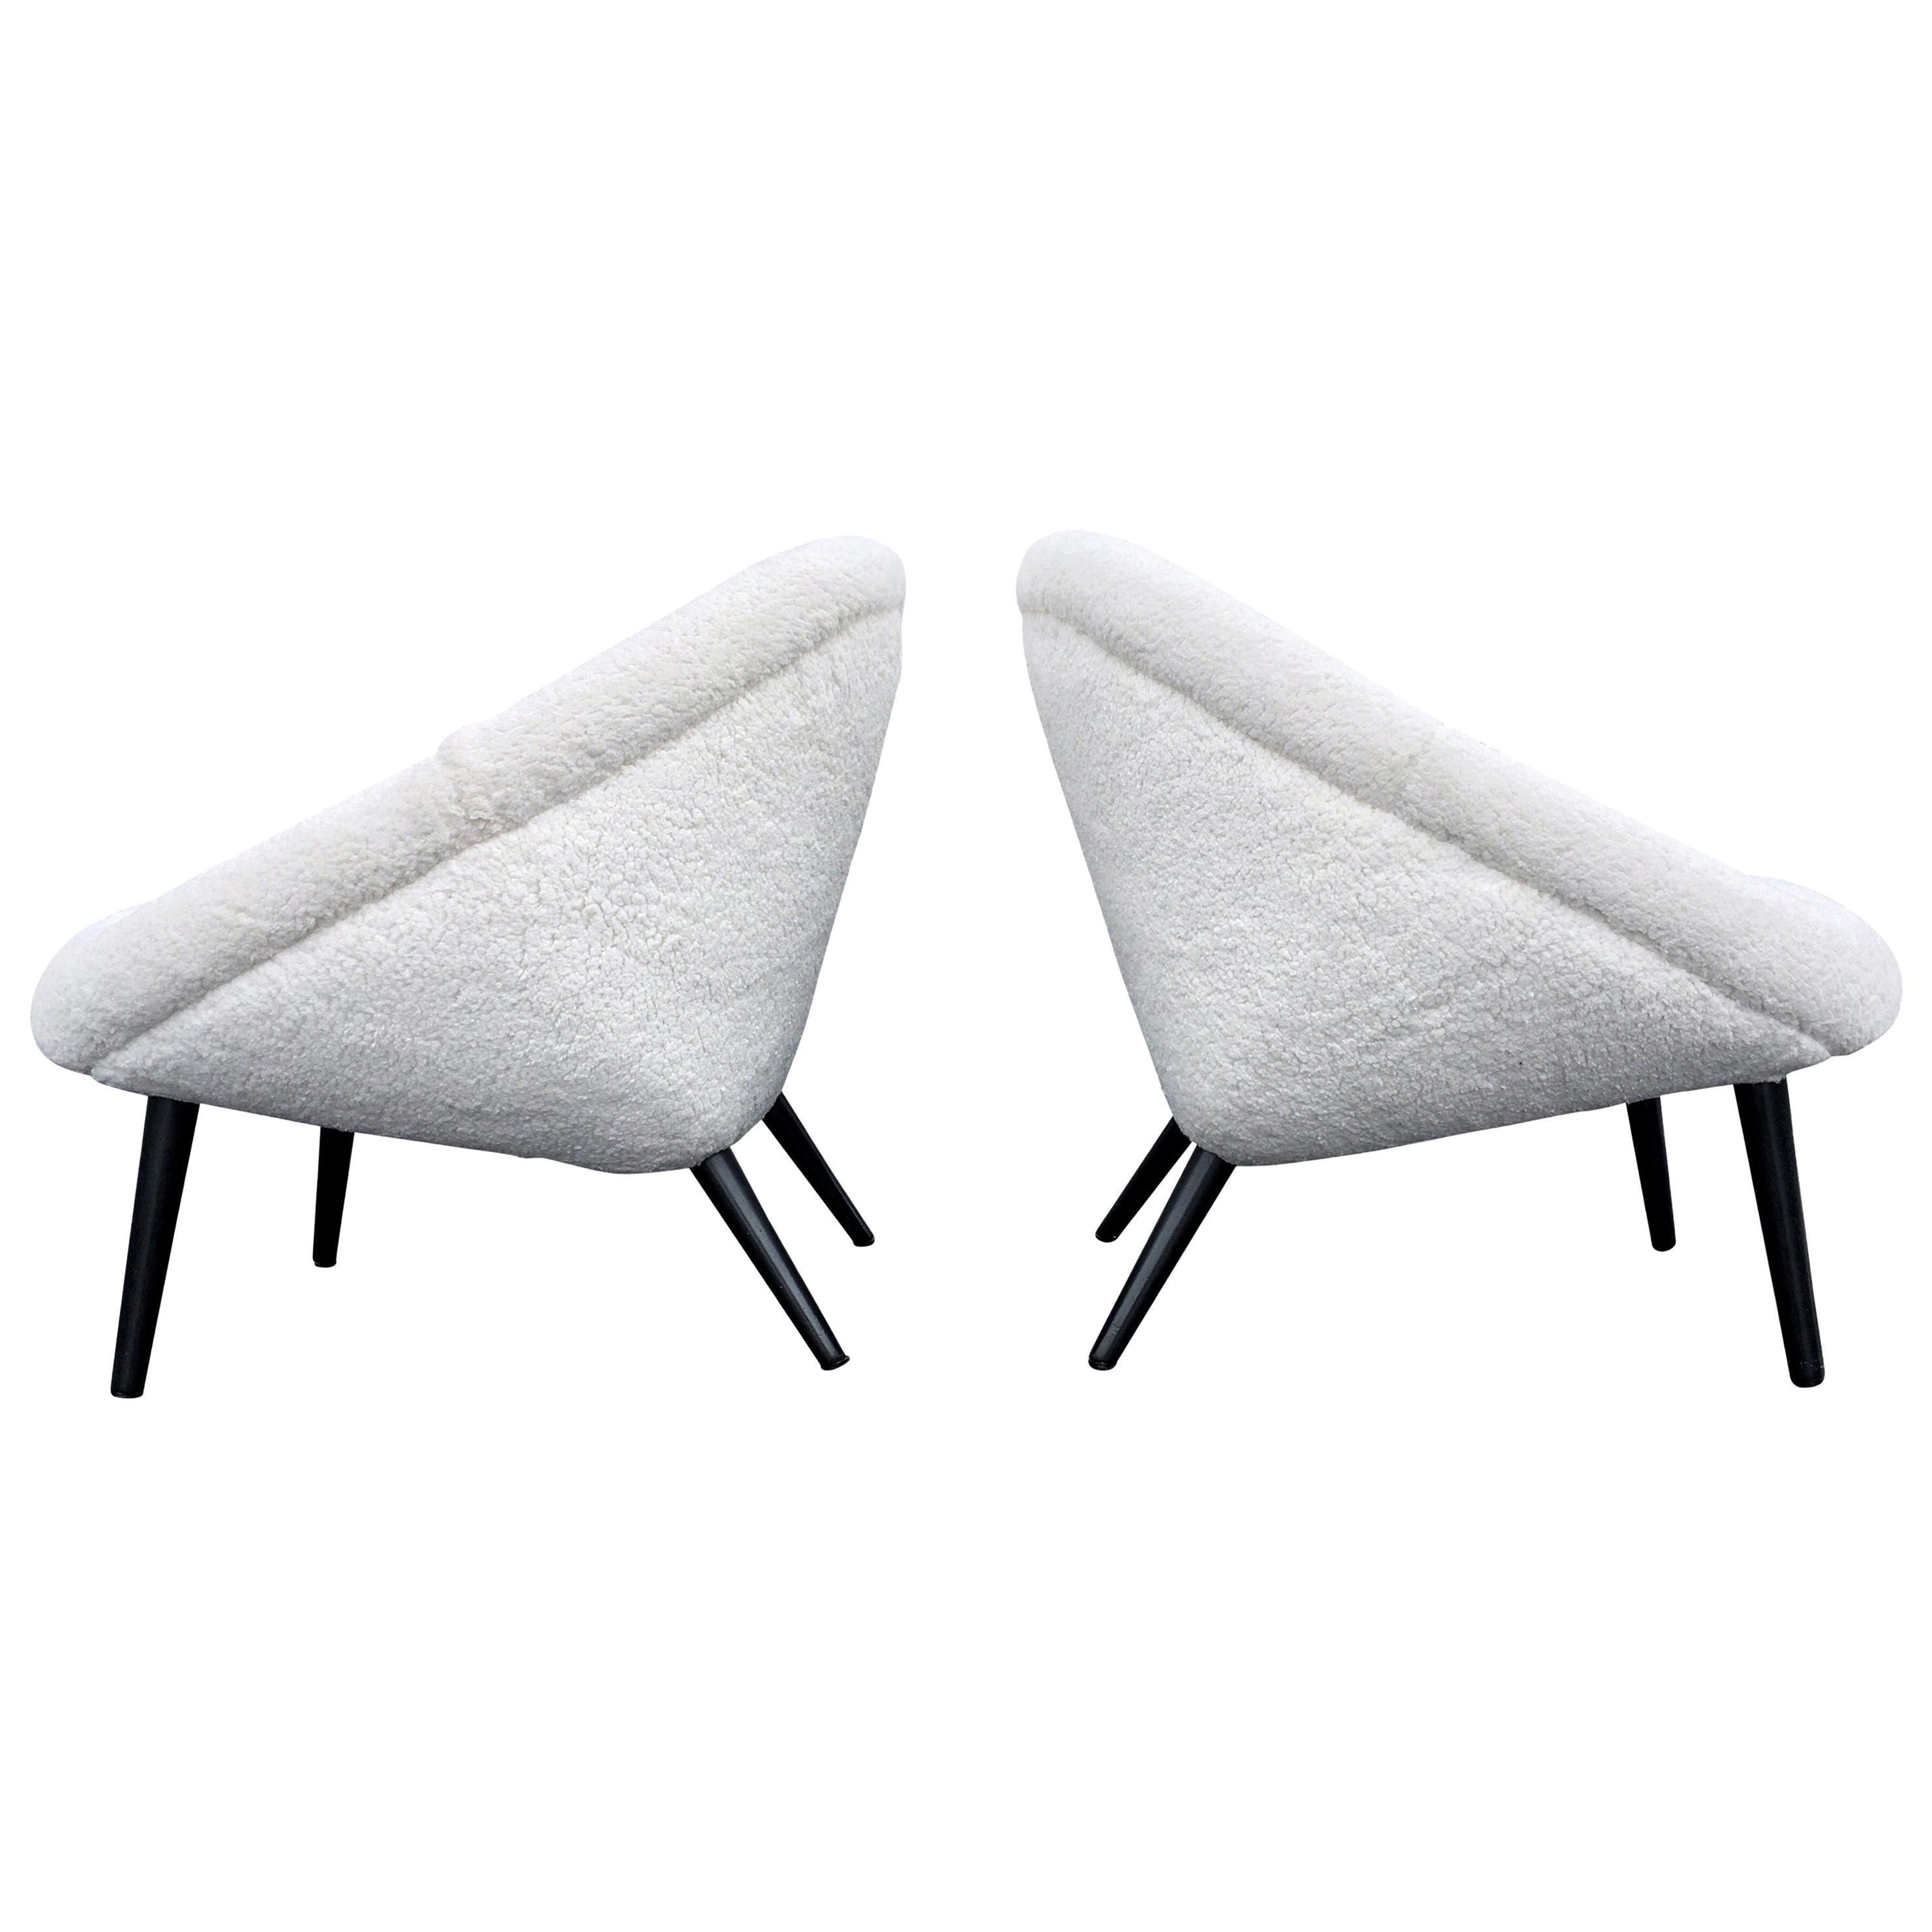 Beautiful 1950s Lounge Chairs, Faux Sheepskin, Midcentury